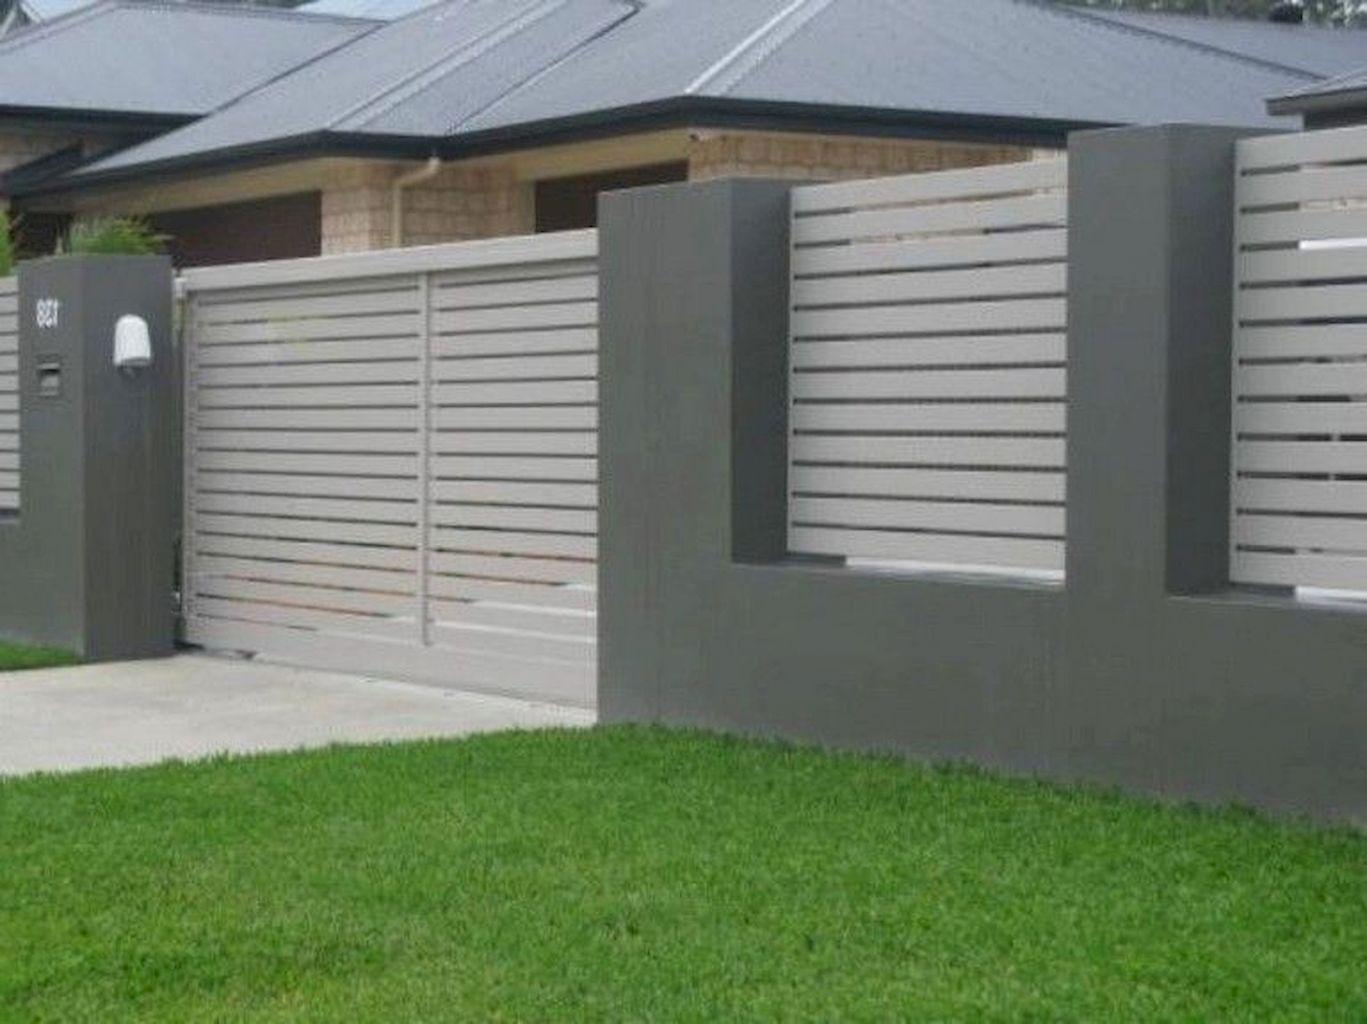 80 Amazing Garden Fence And Gates Design Ideas 99decor Fence Design Modern Fence Wood Fence Design Modern front garden fence ideas